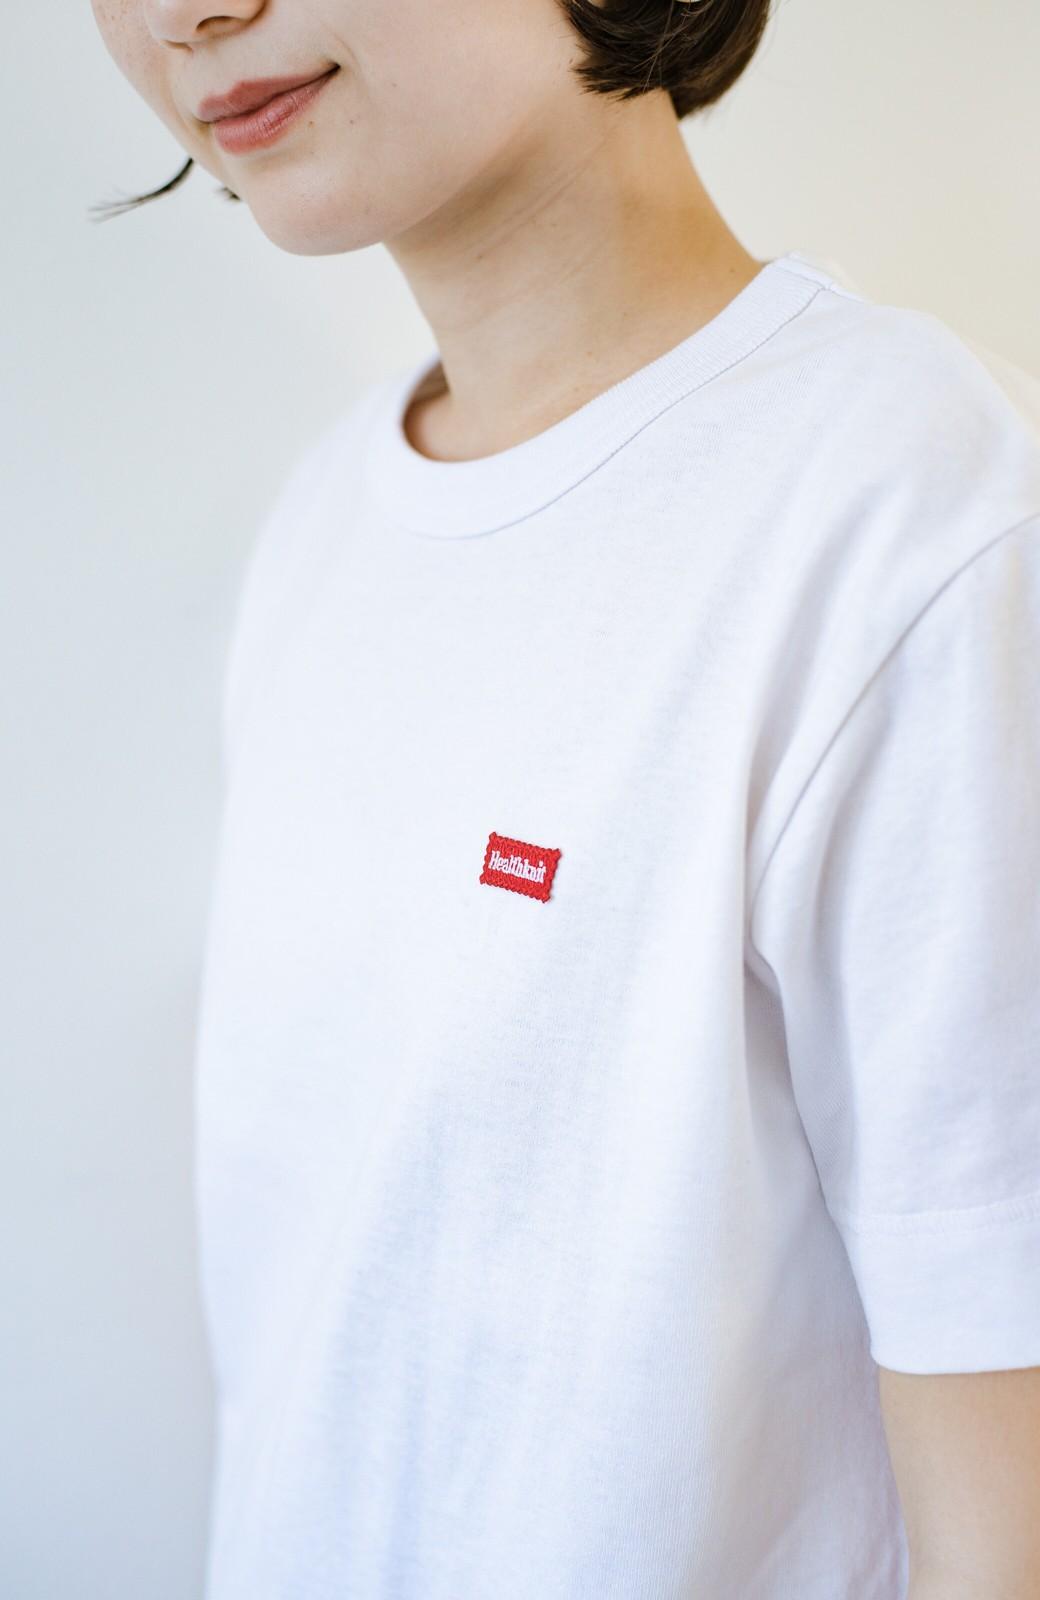 haco! さりげないロゴがコーデのポイントになるファンクションファブリックジャージークルーネックTシャツ by Healthknit <ホワイト>の商品写真3